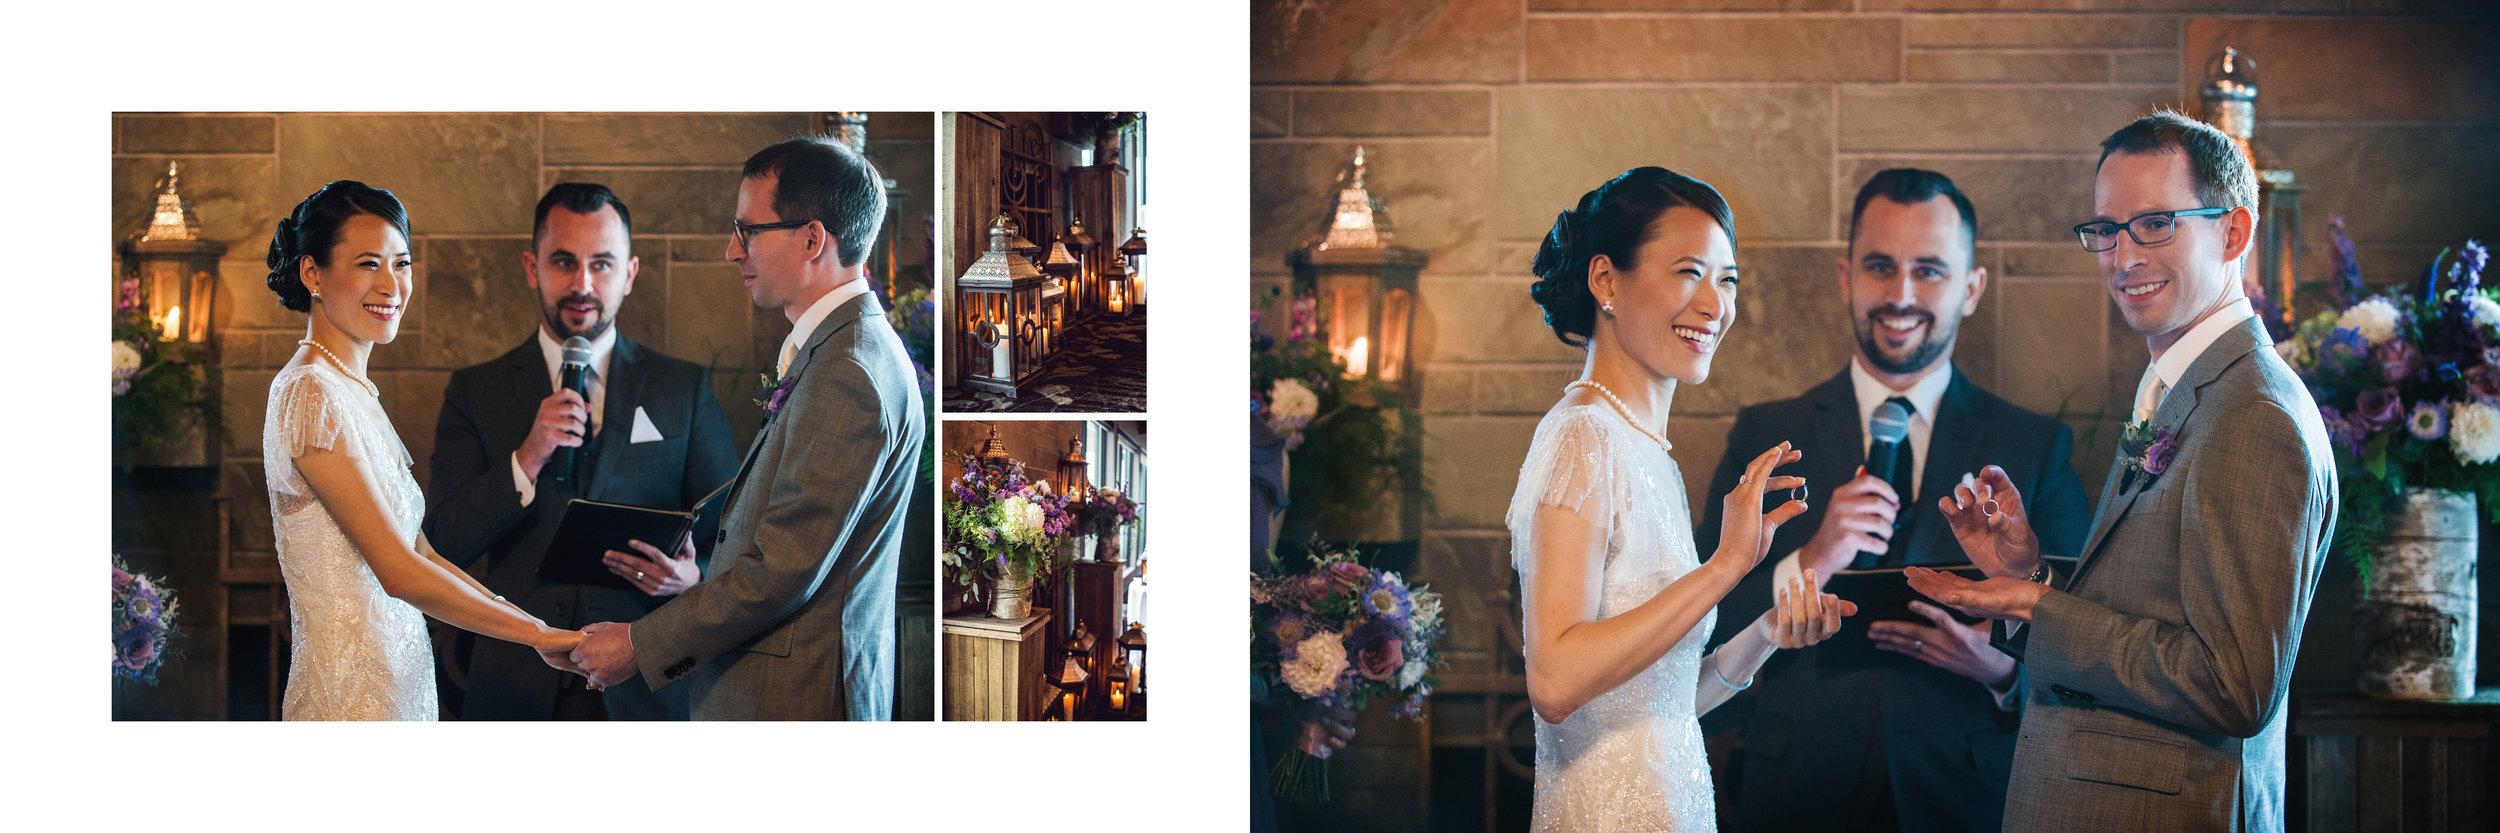 Andrea-Reuben-Grouse-Mountain-Wedding-Real-Weddings-Feature-Yaletown-Photography-011.jpg